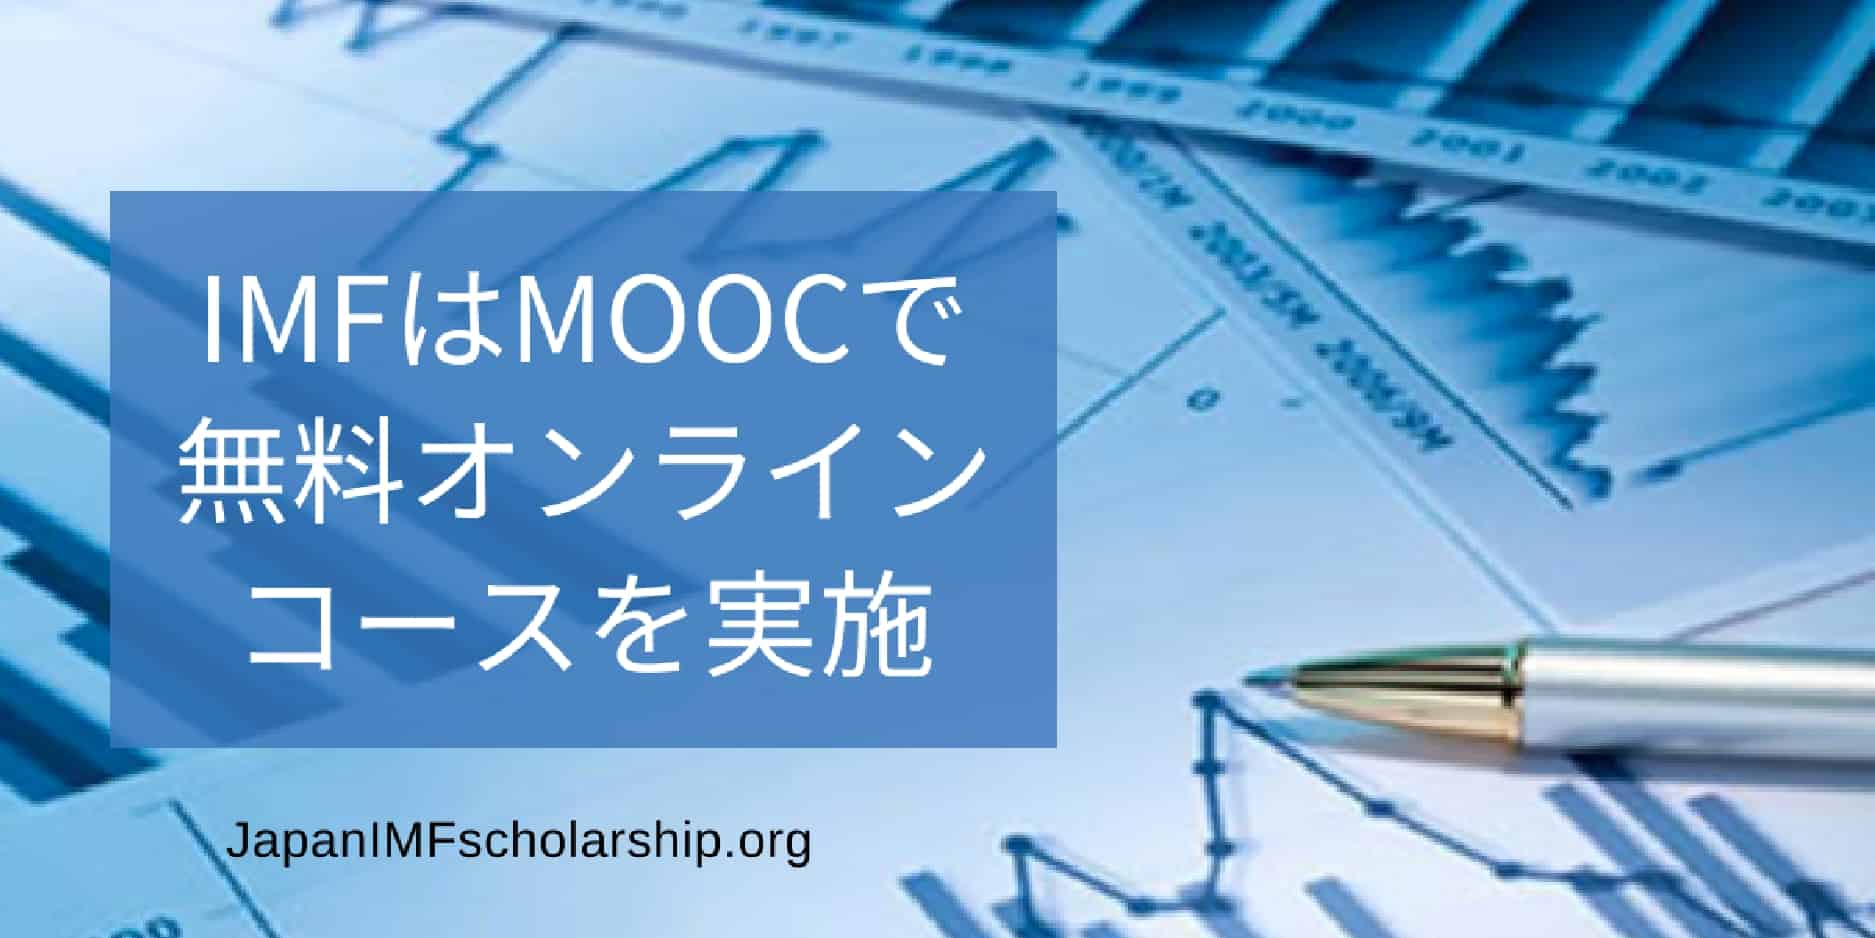 jisp web-fb IMF-x on Mooc | visit japanimfscholarship.org